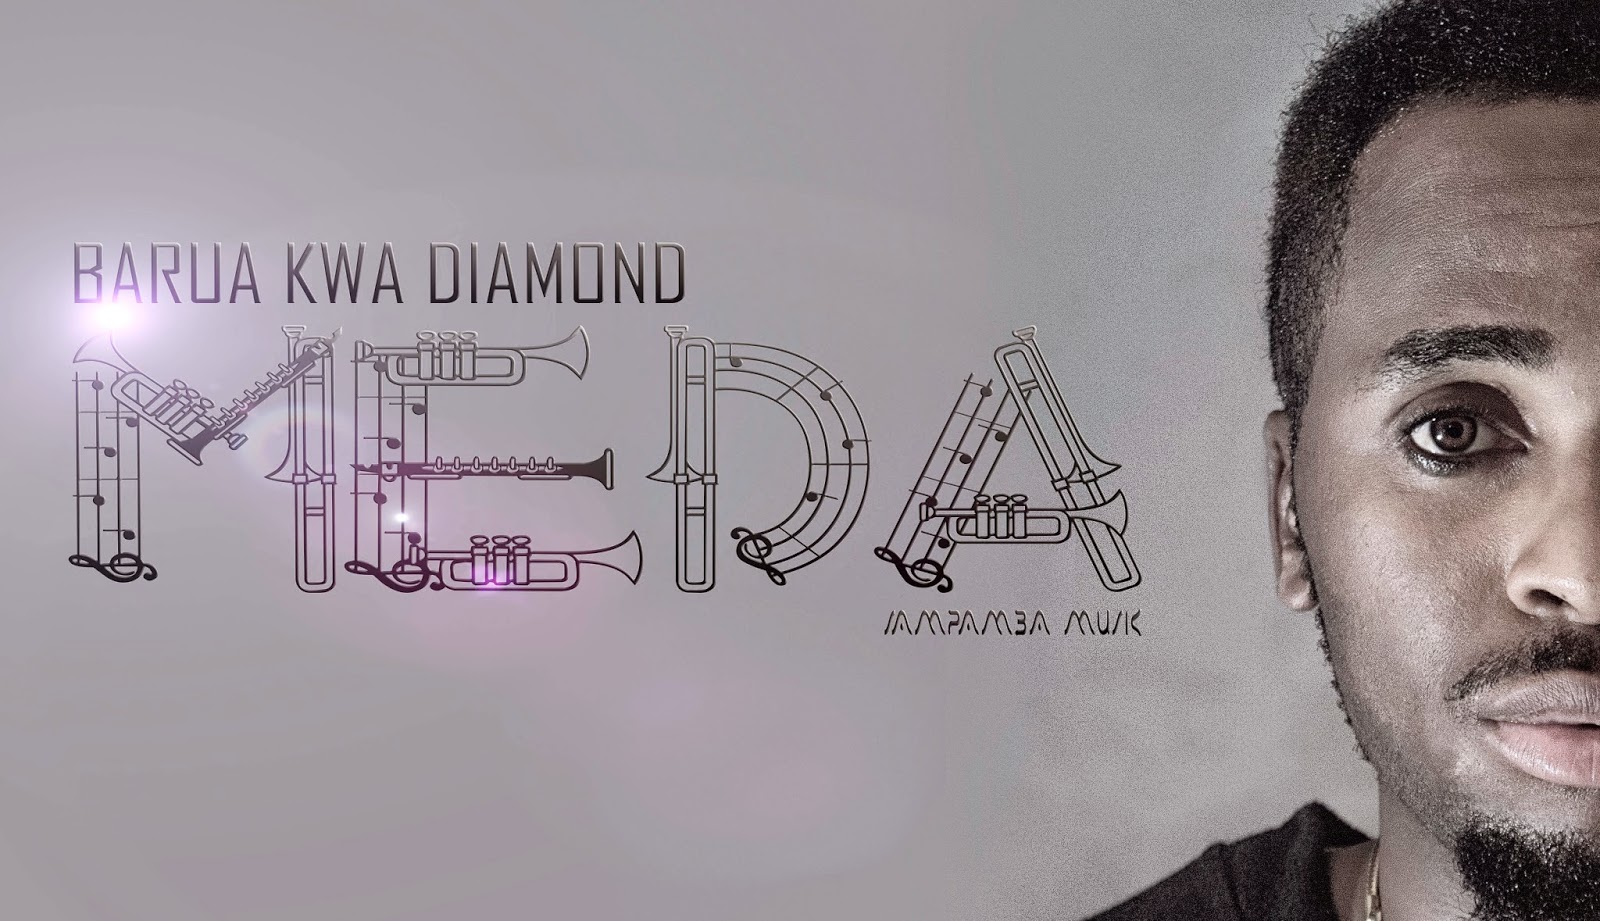 Madison : Dj mwanga diamond kanyaga video download